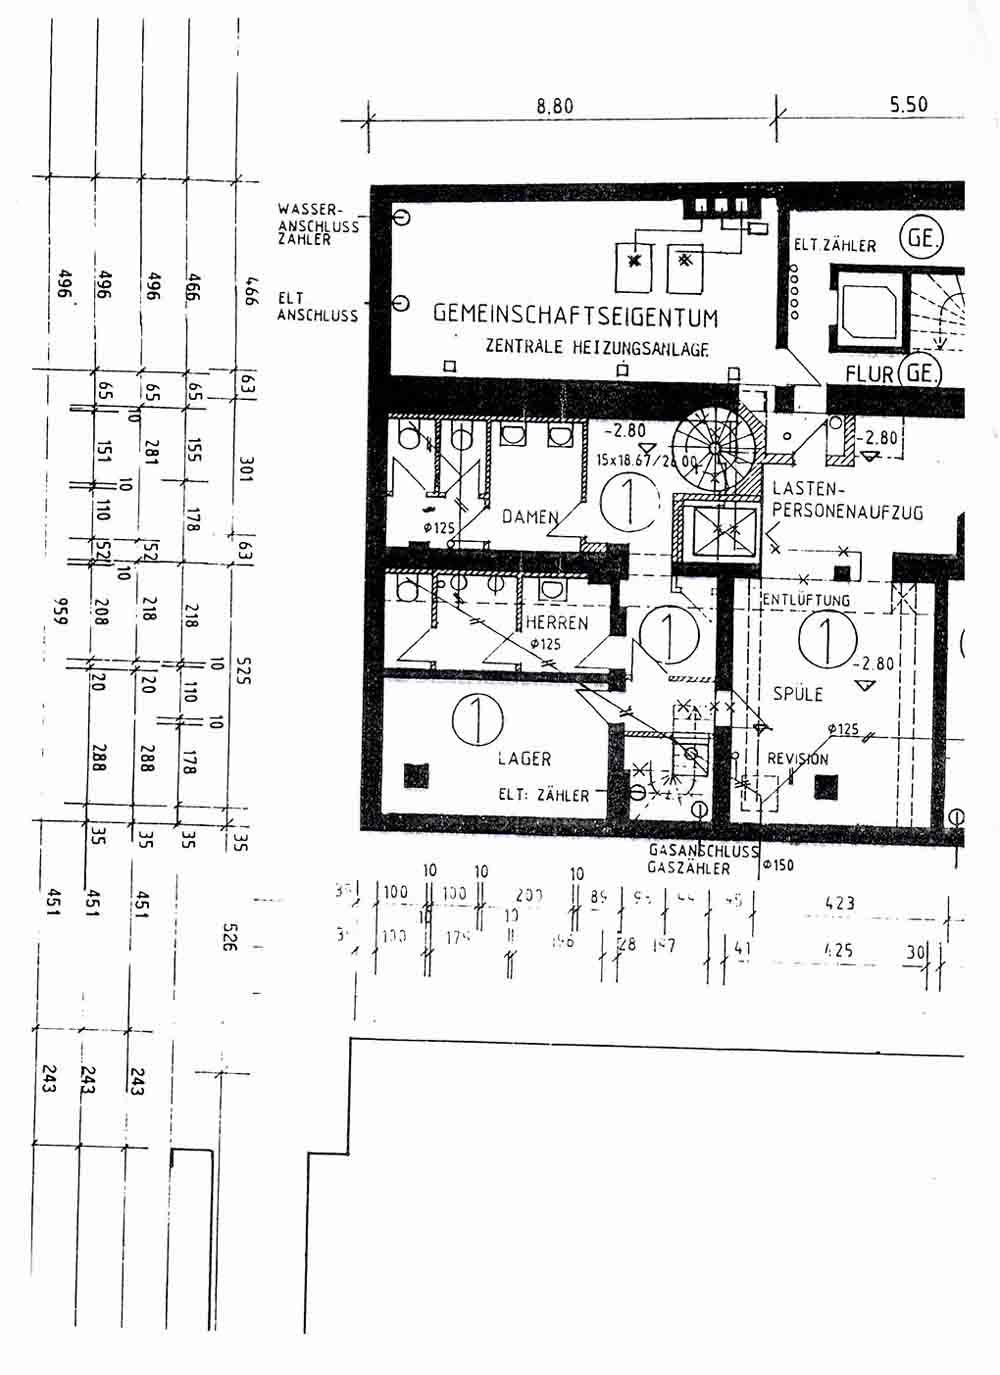 LUBIG Immobilien - Expose 03 - Gastronomie Theaterplatz Grundriss UG